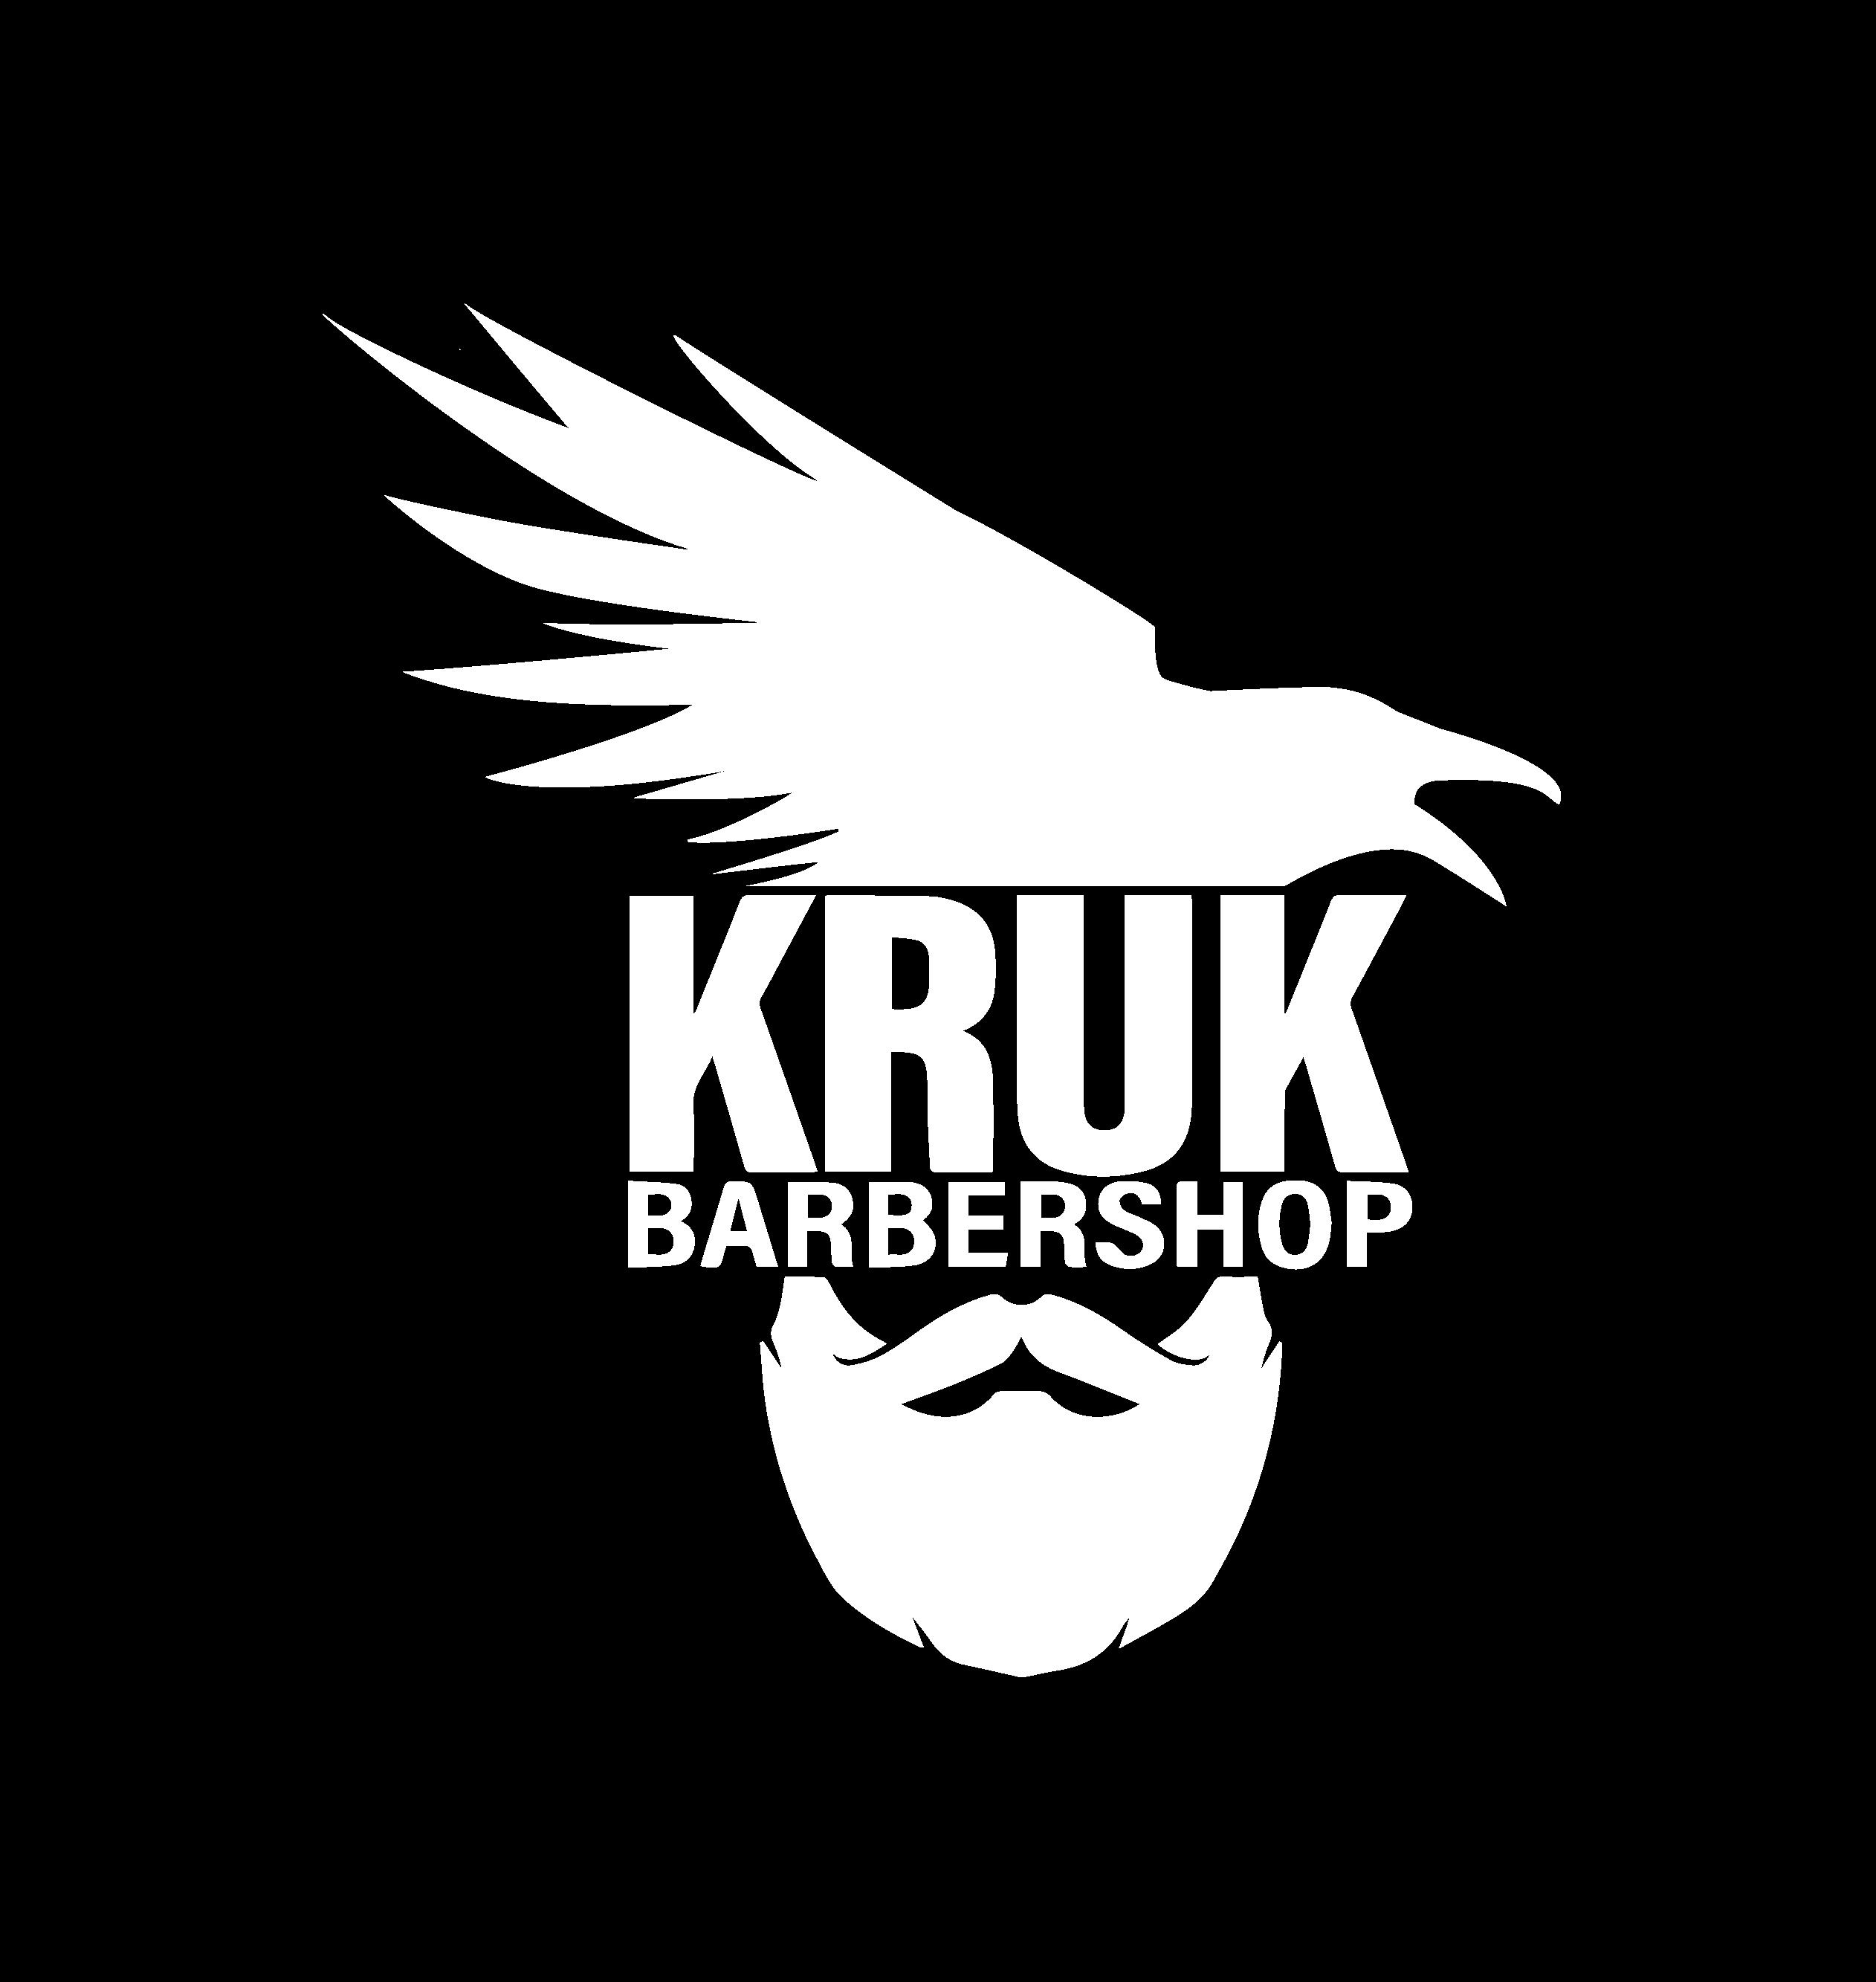 Kruk Barbershop